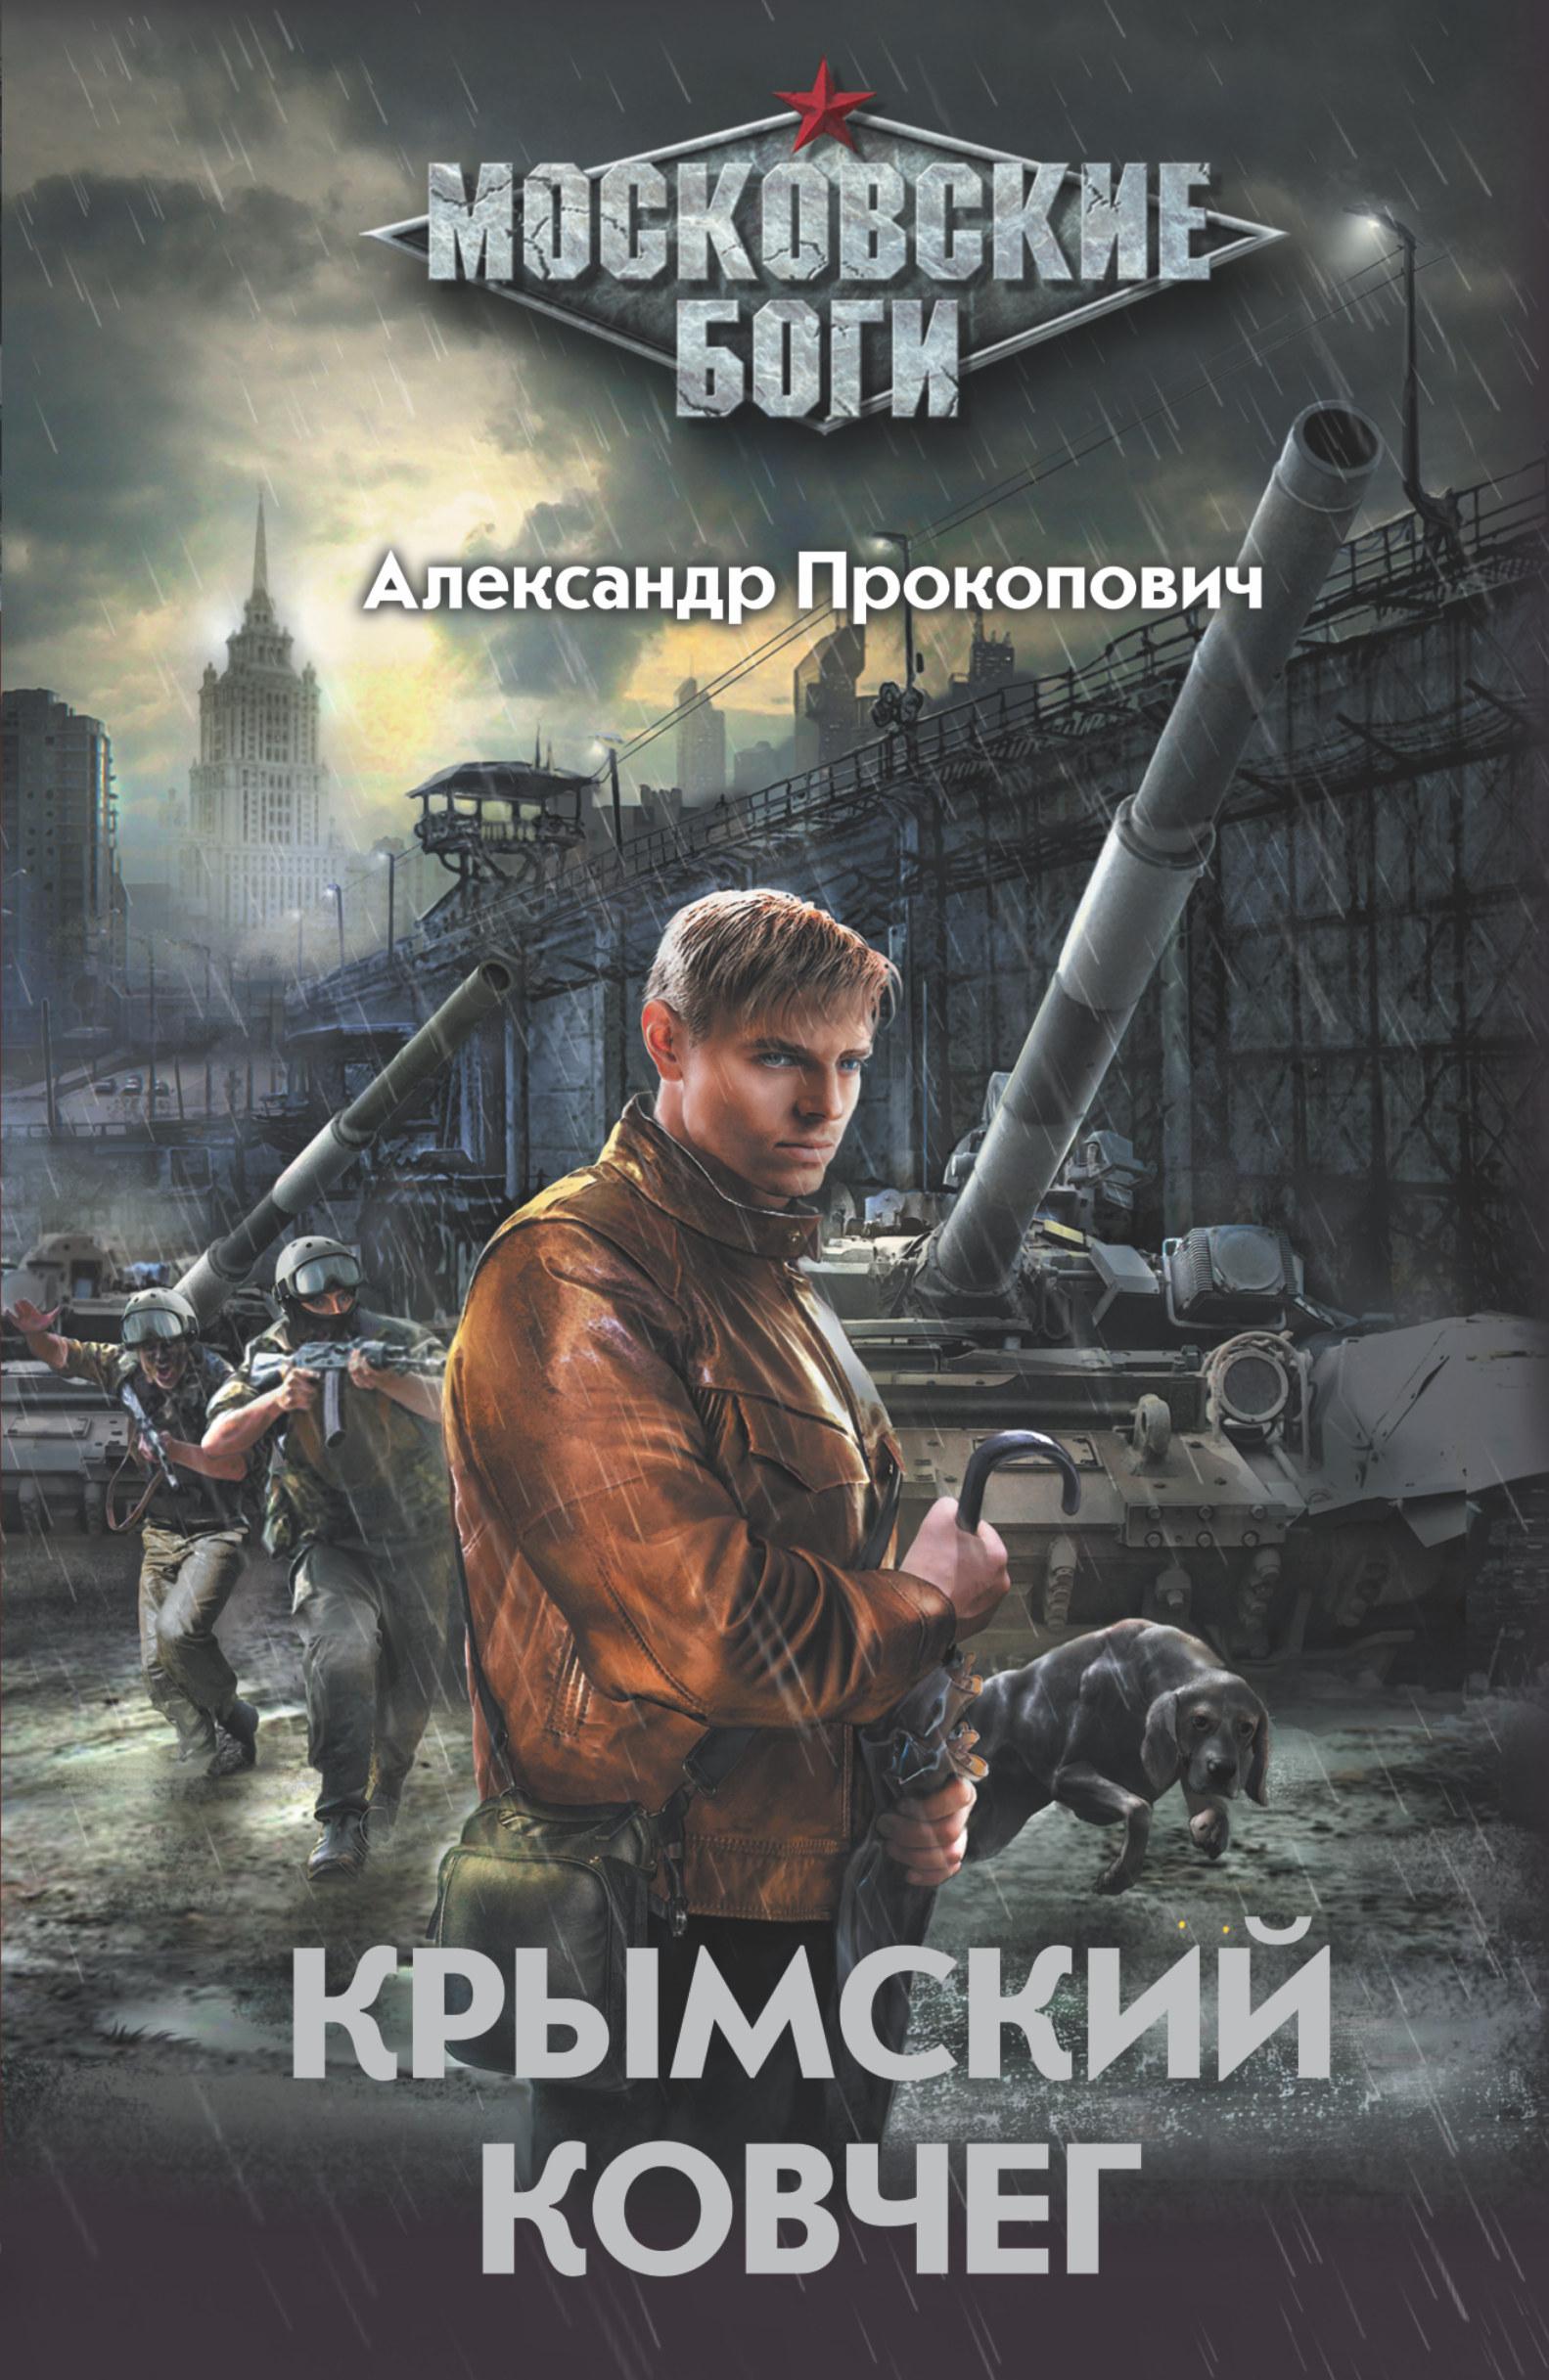 Прокопович А.А. Крымский ковчег